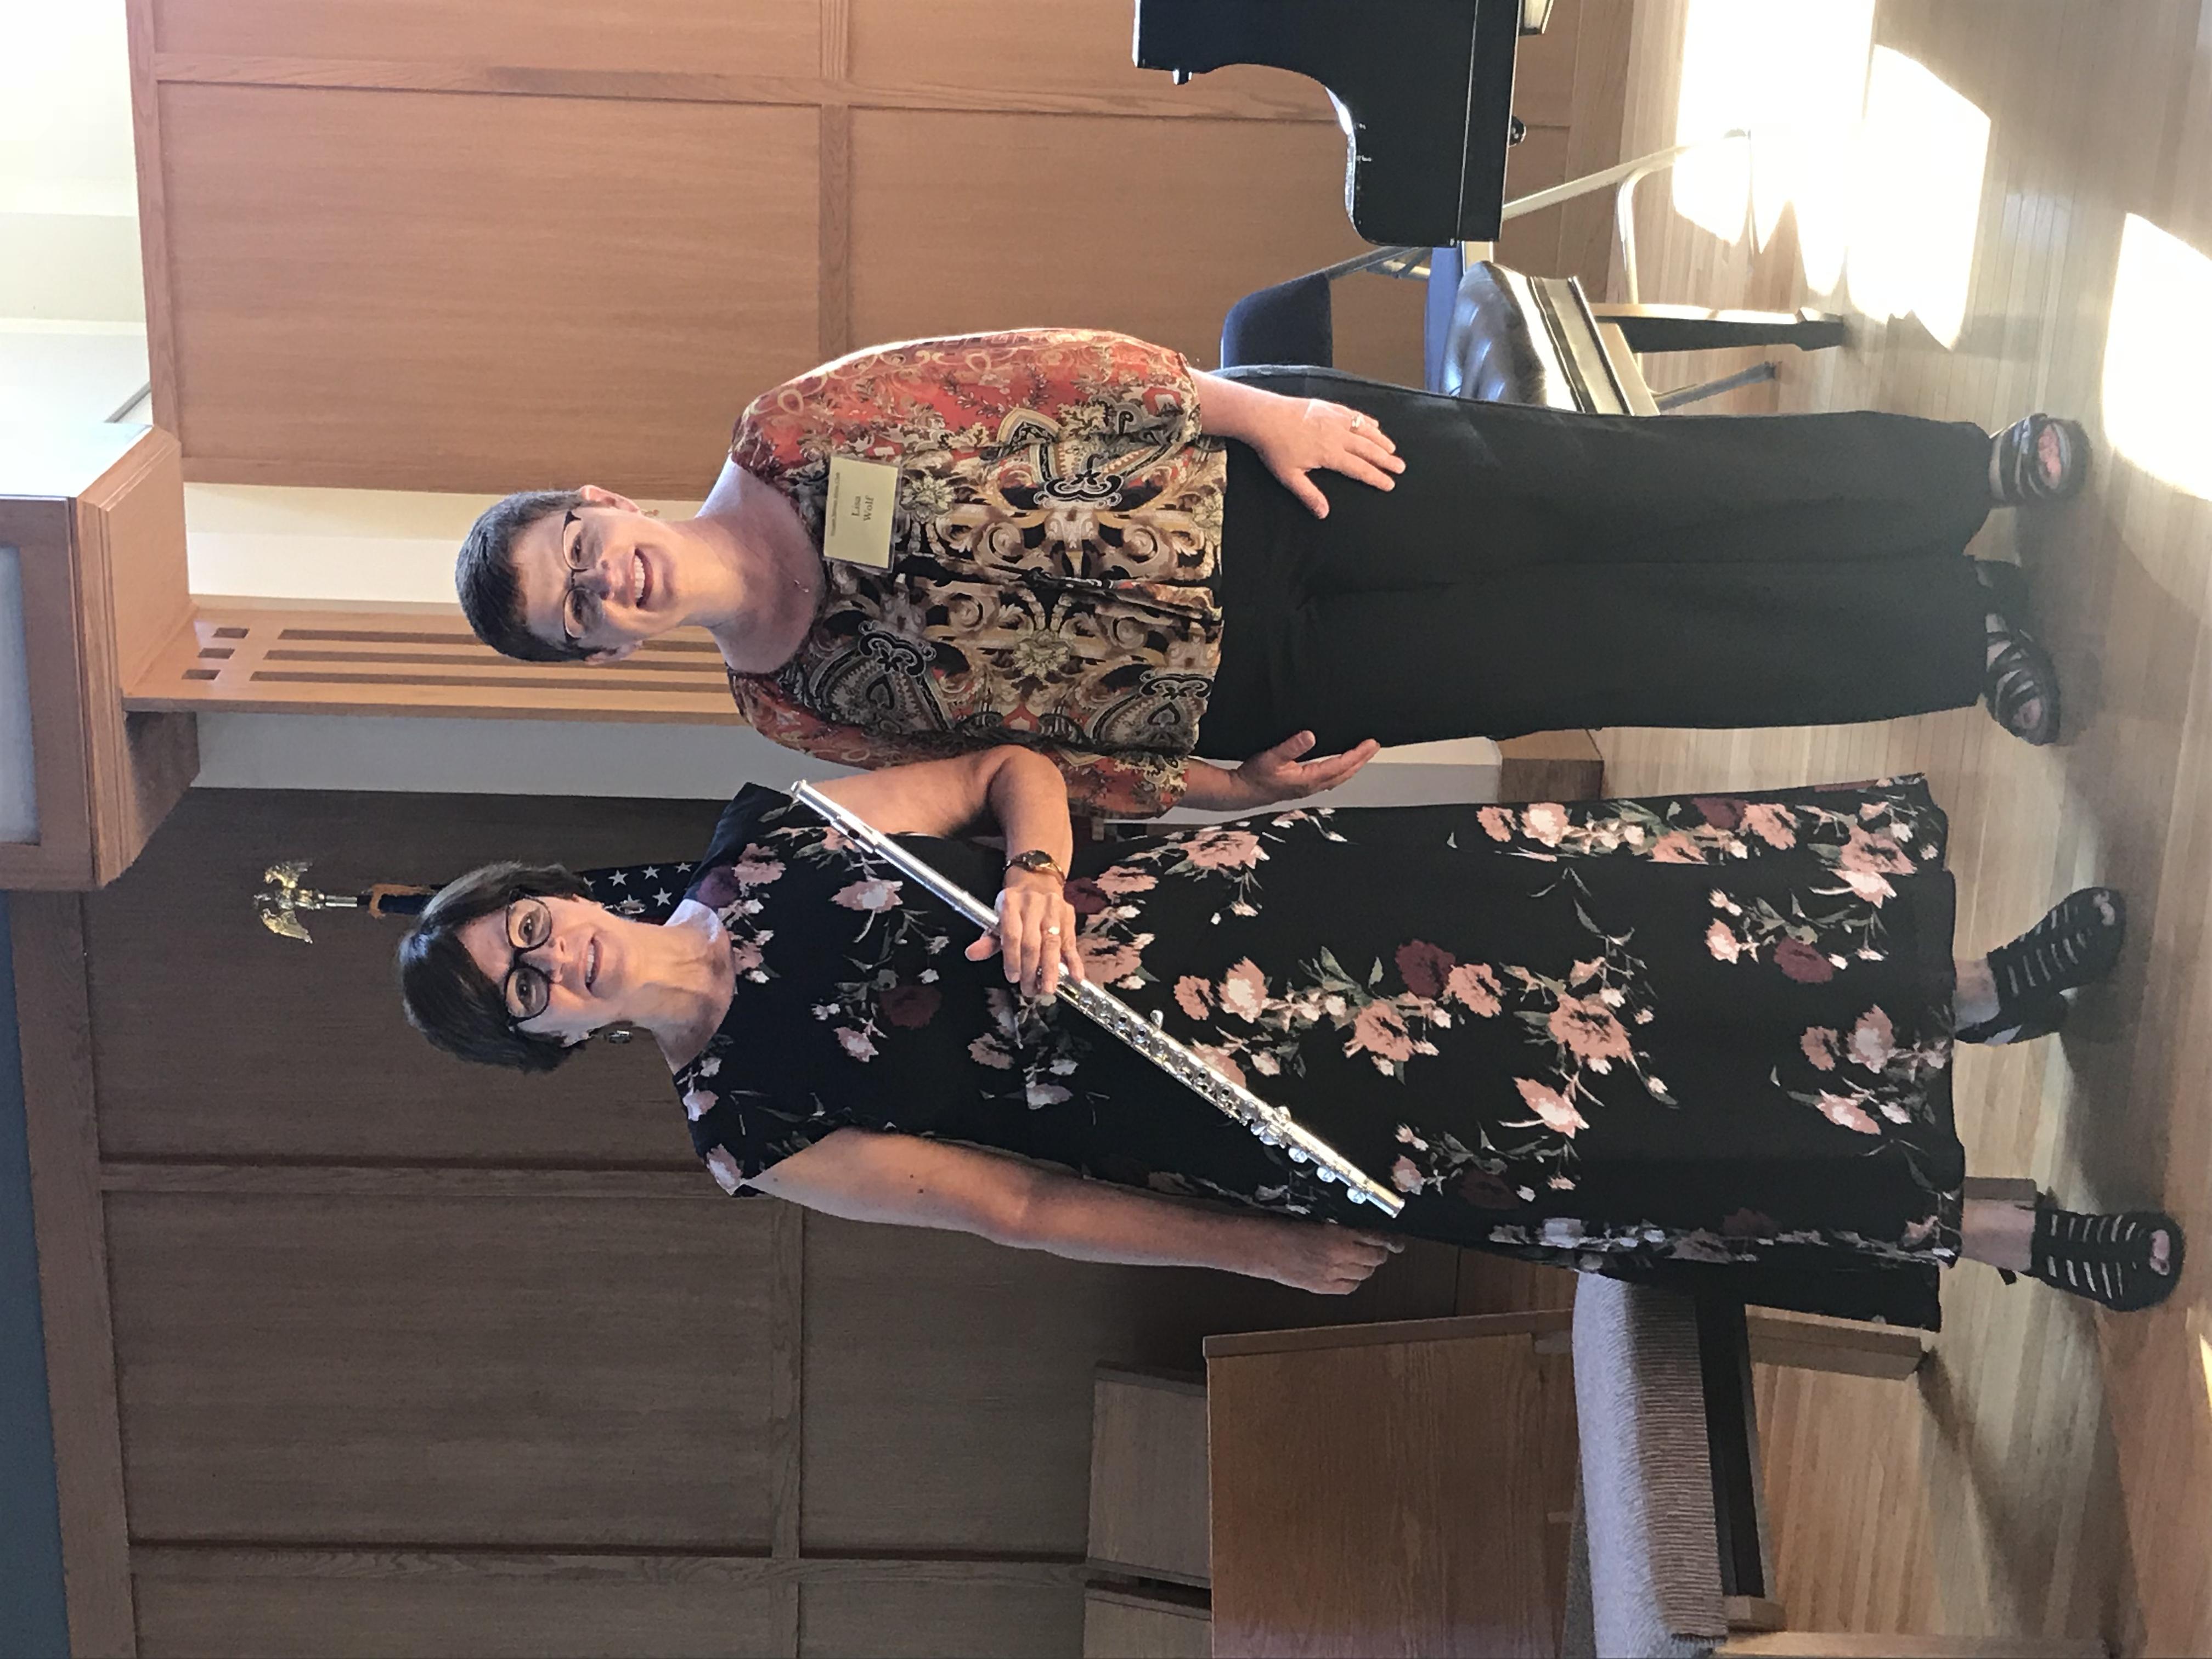 Karin Ursin and Lisa Wolf